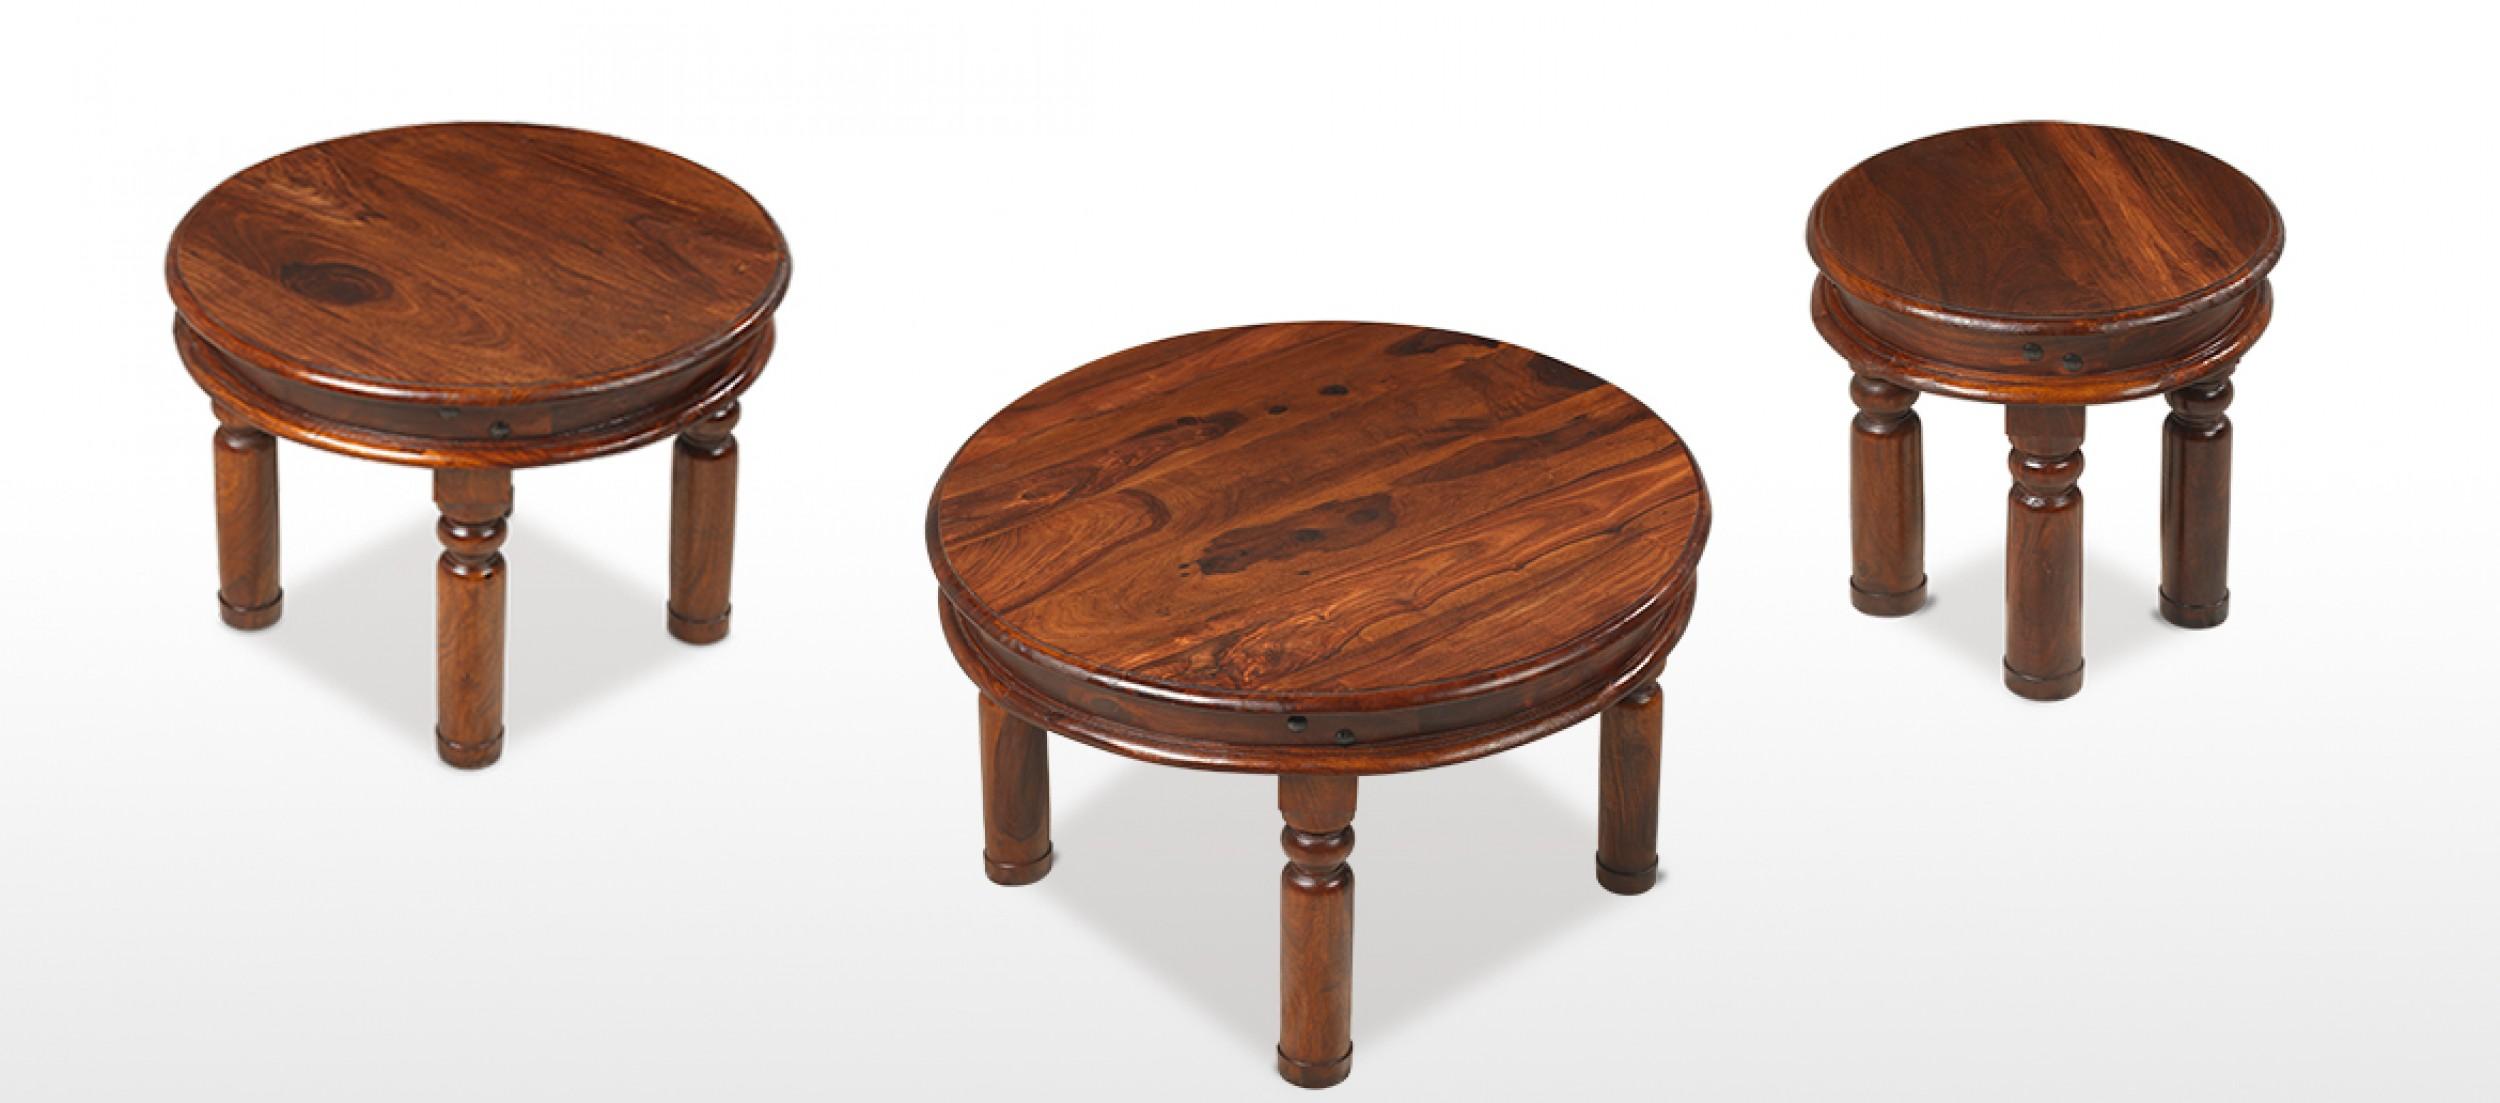 Jali Sheesham 70 cm Round Thakat Coffee Table Quercus Living